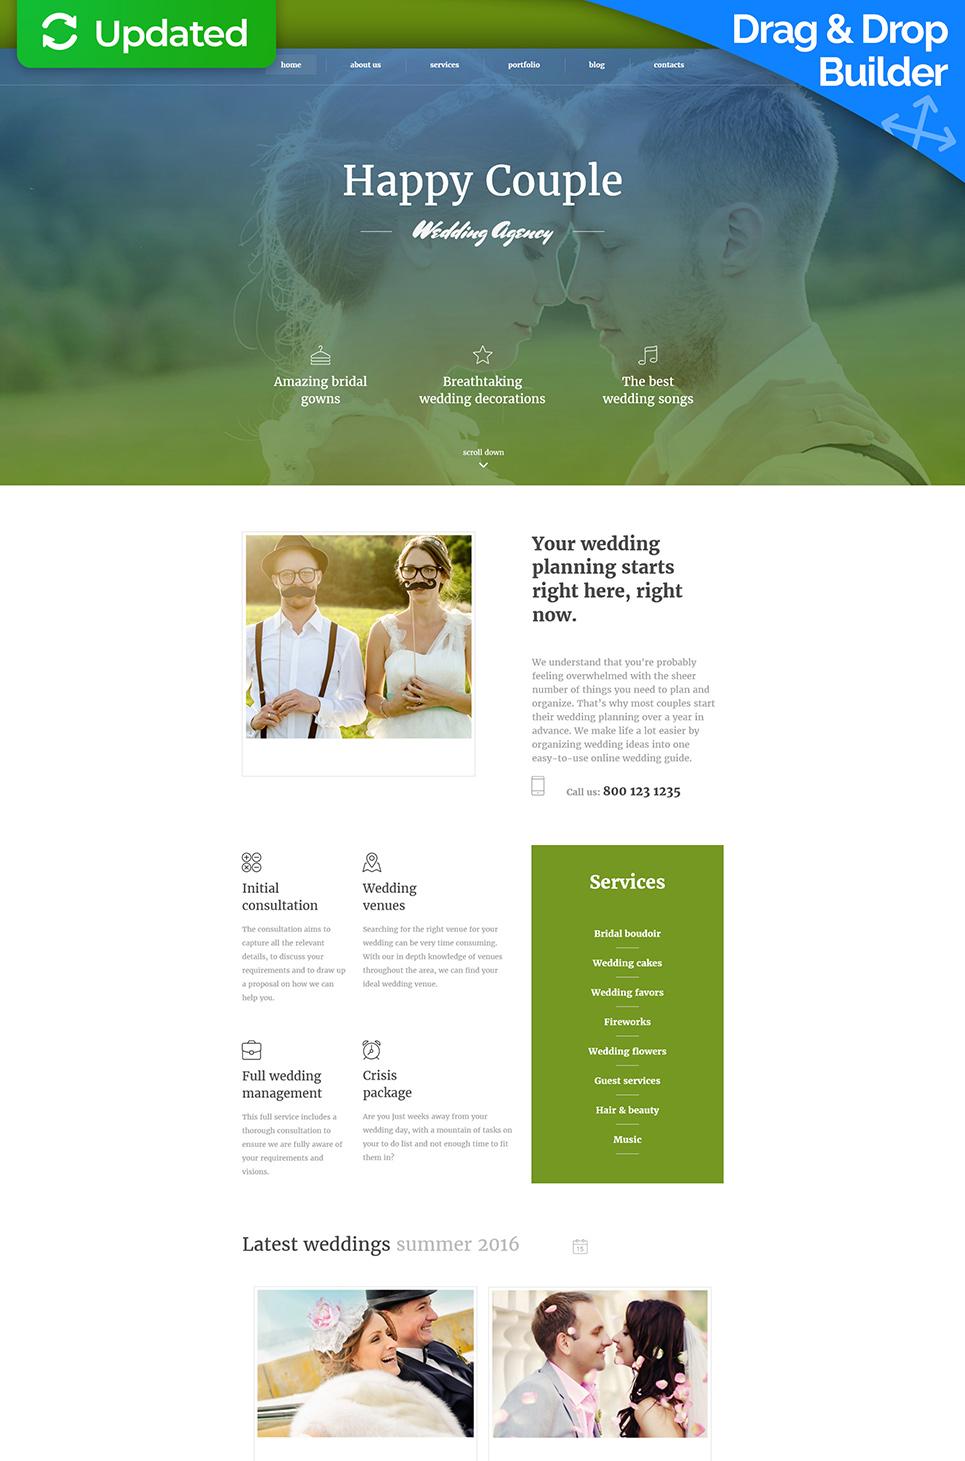 Happy Couple Responsive Website Template - image